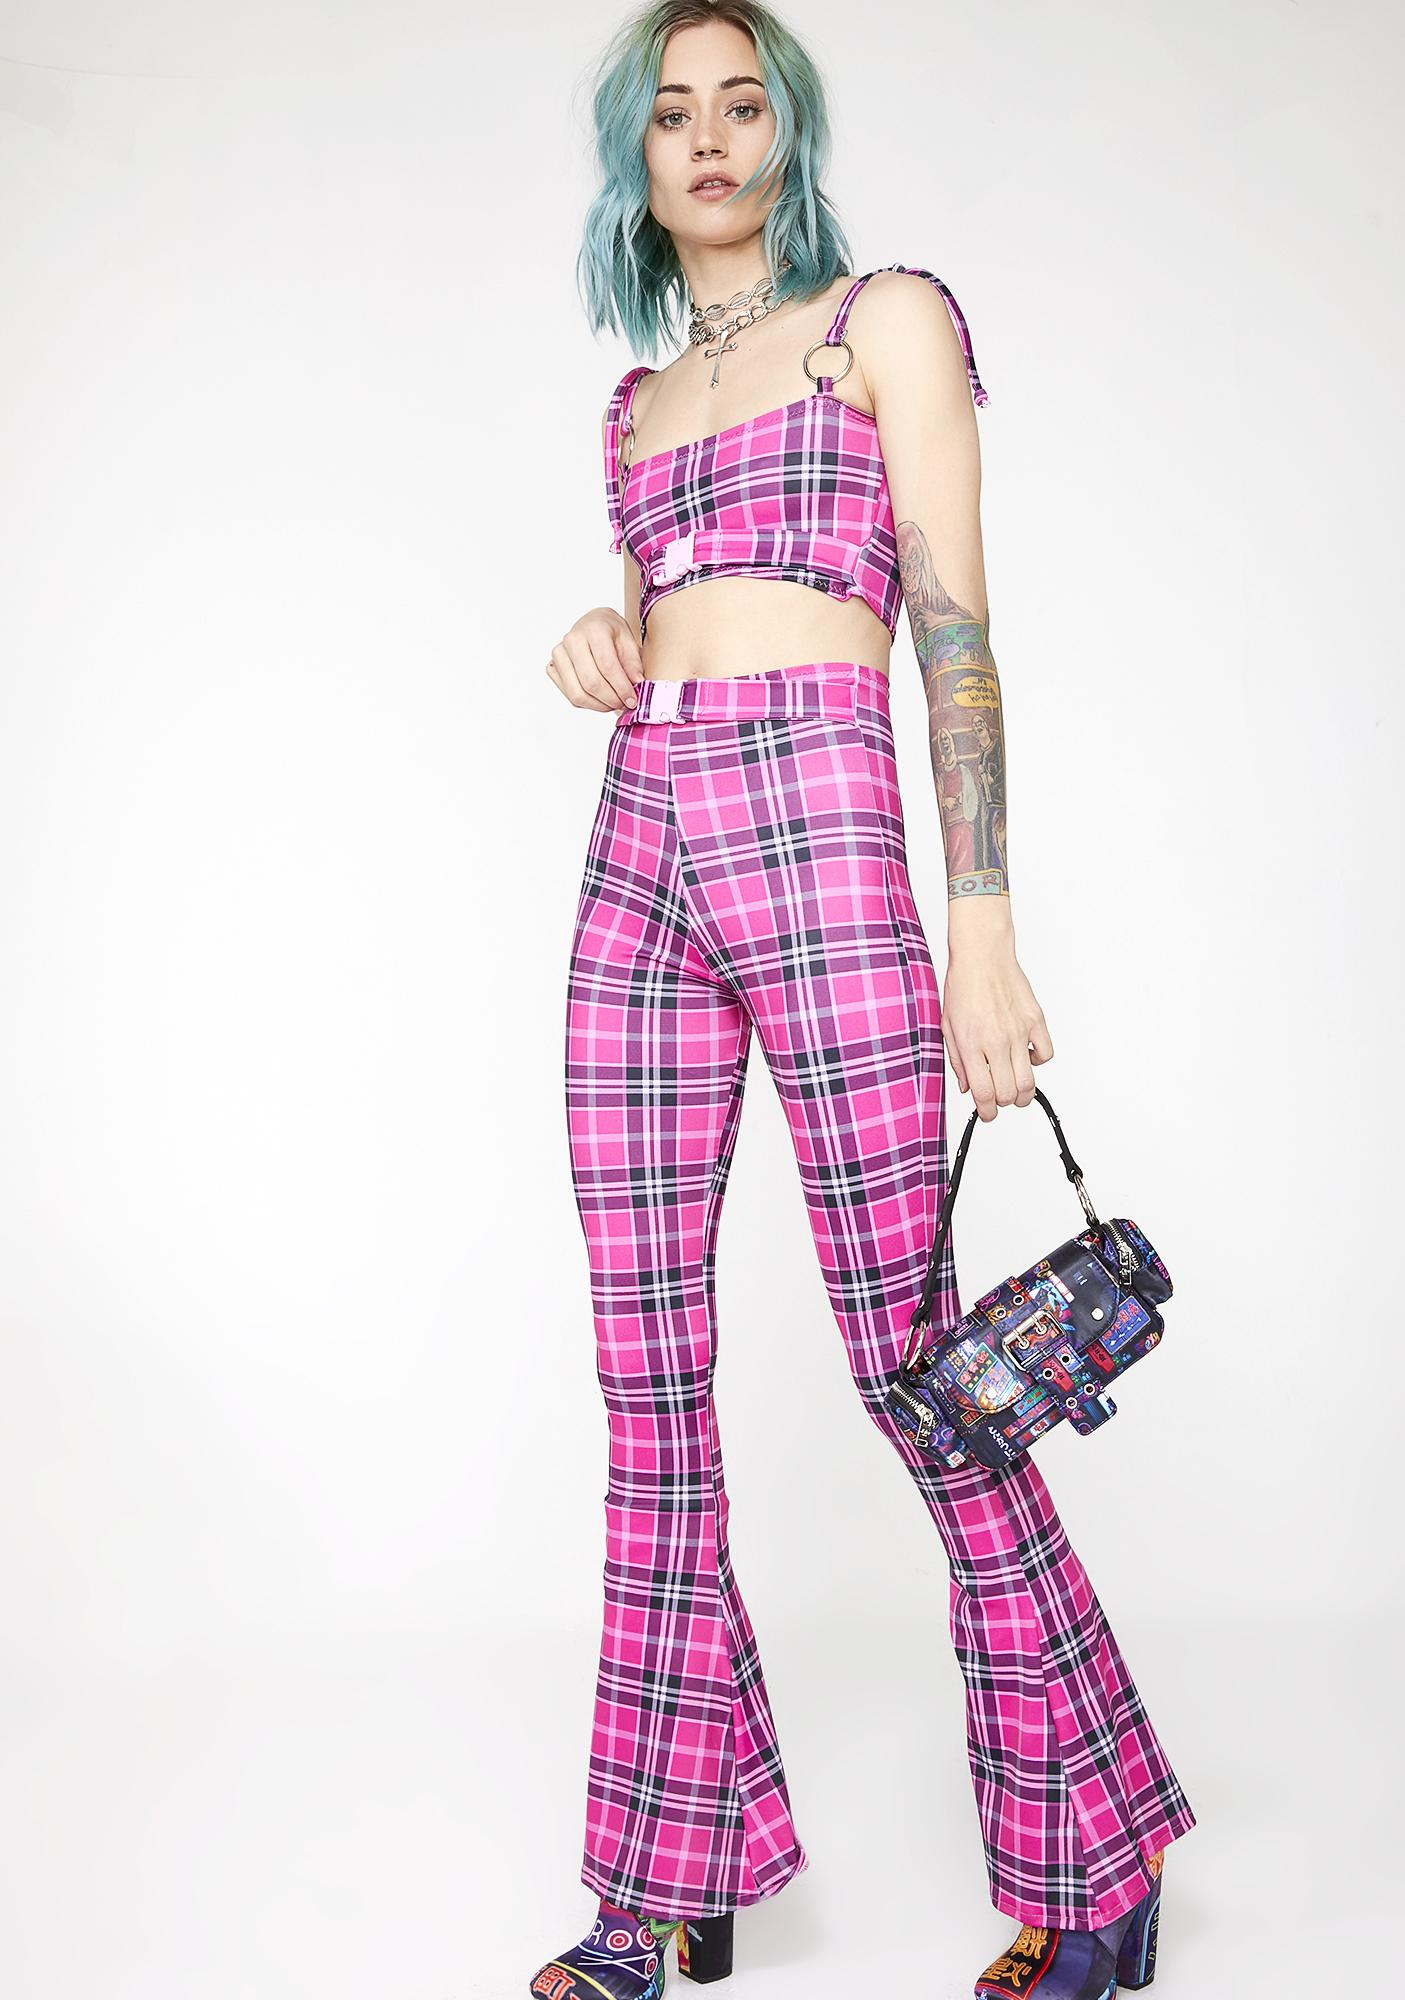 Babydol Clothing Pixie Tartan Flares